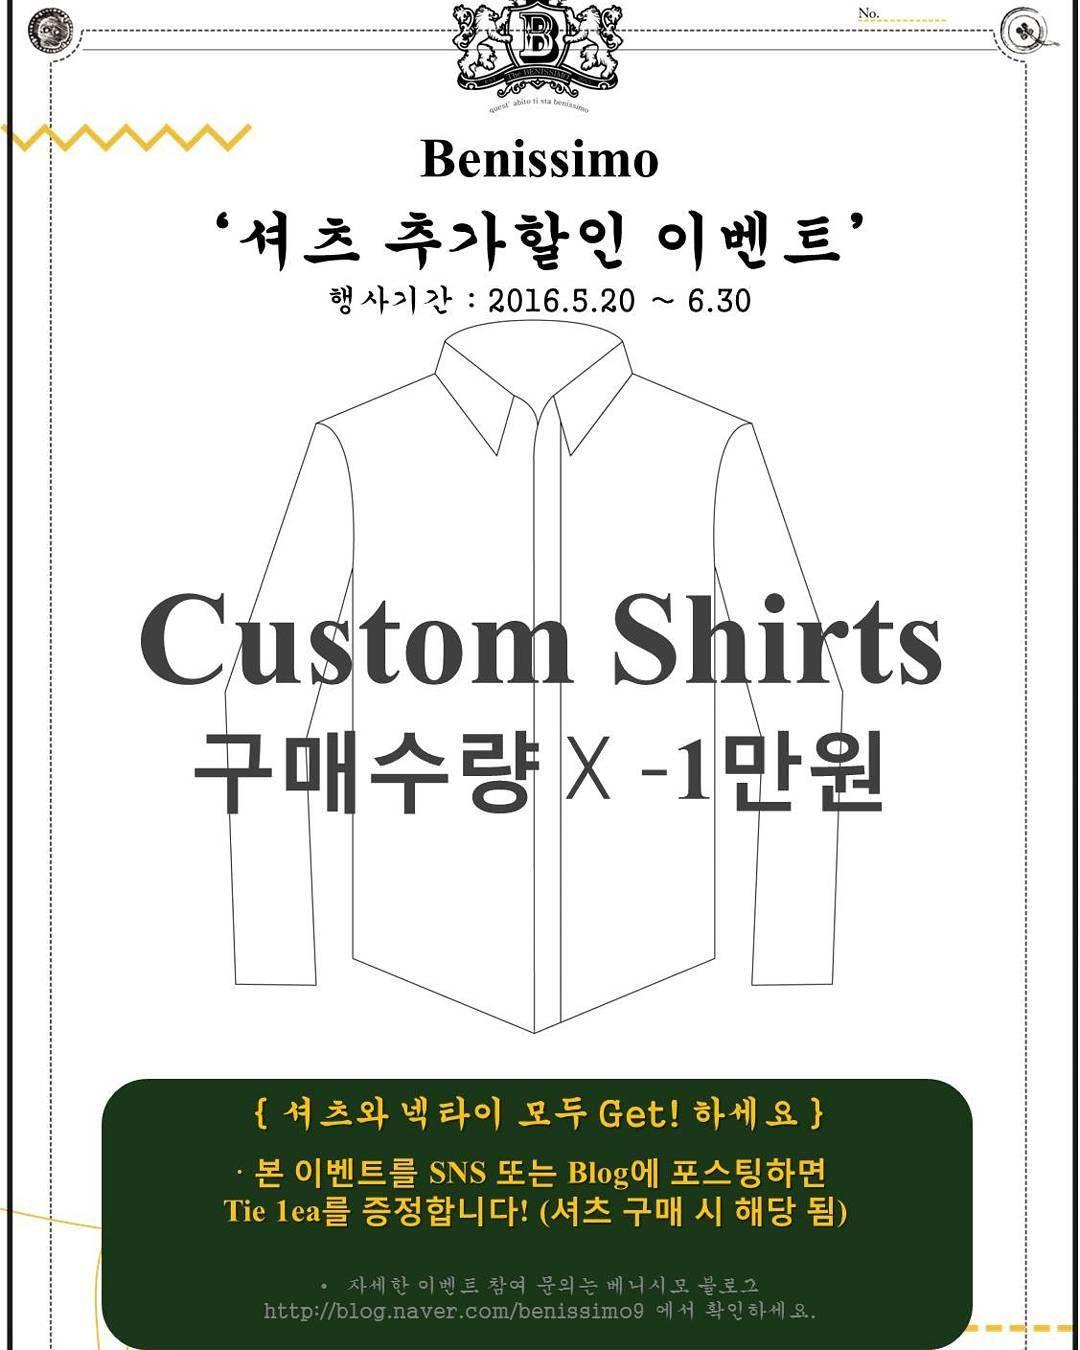 'Benissimo shirts promotion'  인천 맞춤정장 베니시모가 고객님들의 성원에 힘입어 여름맞이 맞춤셔츠 할인 프로모션을 전개합니다. 원단 및 디자인에 관계없이 구매수량에 1만원씩을 할인해드리고 있습니다. 더불어 이벤트에 참여하시는 분들에 한해 블로그 및 SNS에 본이벤트를 포스팅 해주시는 분들께 넥타이를 추가로 증정해드리고 있습니다 많은 관심 부탁드립니다. 감사합니다 #benissimo #shirts #event #promotion #tailorshop #incheon #suit #daily #dailylook #ootd #classic #menswear #mensfashion #베니시모 #인천 #구월동 #맞춤정장 #인천맞춤정장 #테일러샵 #이벤트 #커플셔츠 #데일리 #데일리룩 #오오티디 #맨즈웨어 #멋스타그램 by benissimo_moonchae.jung